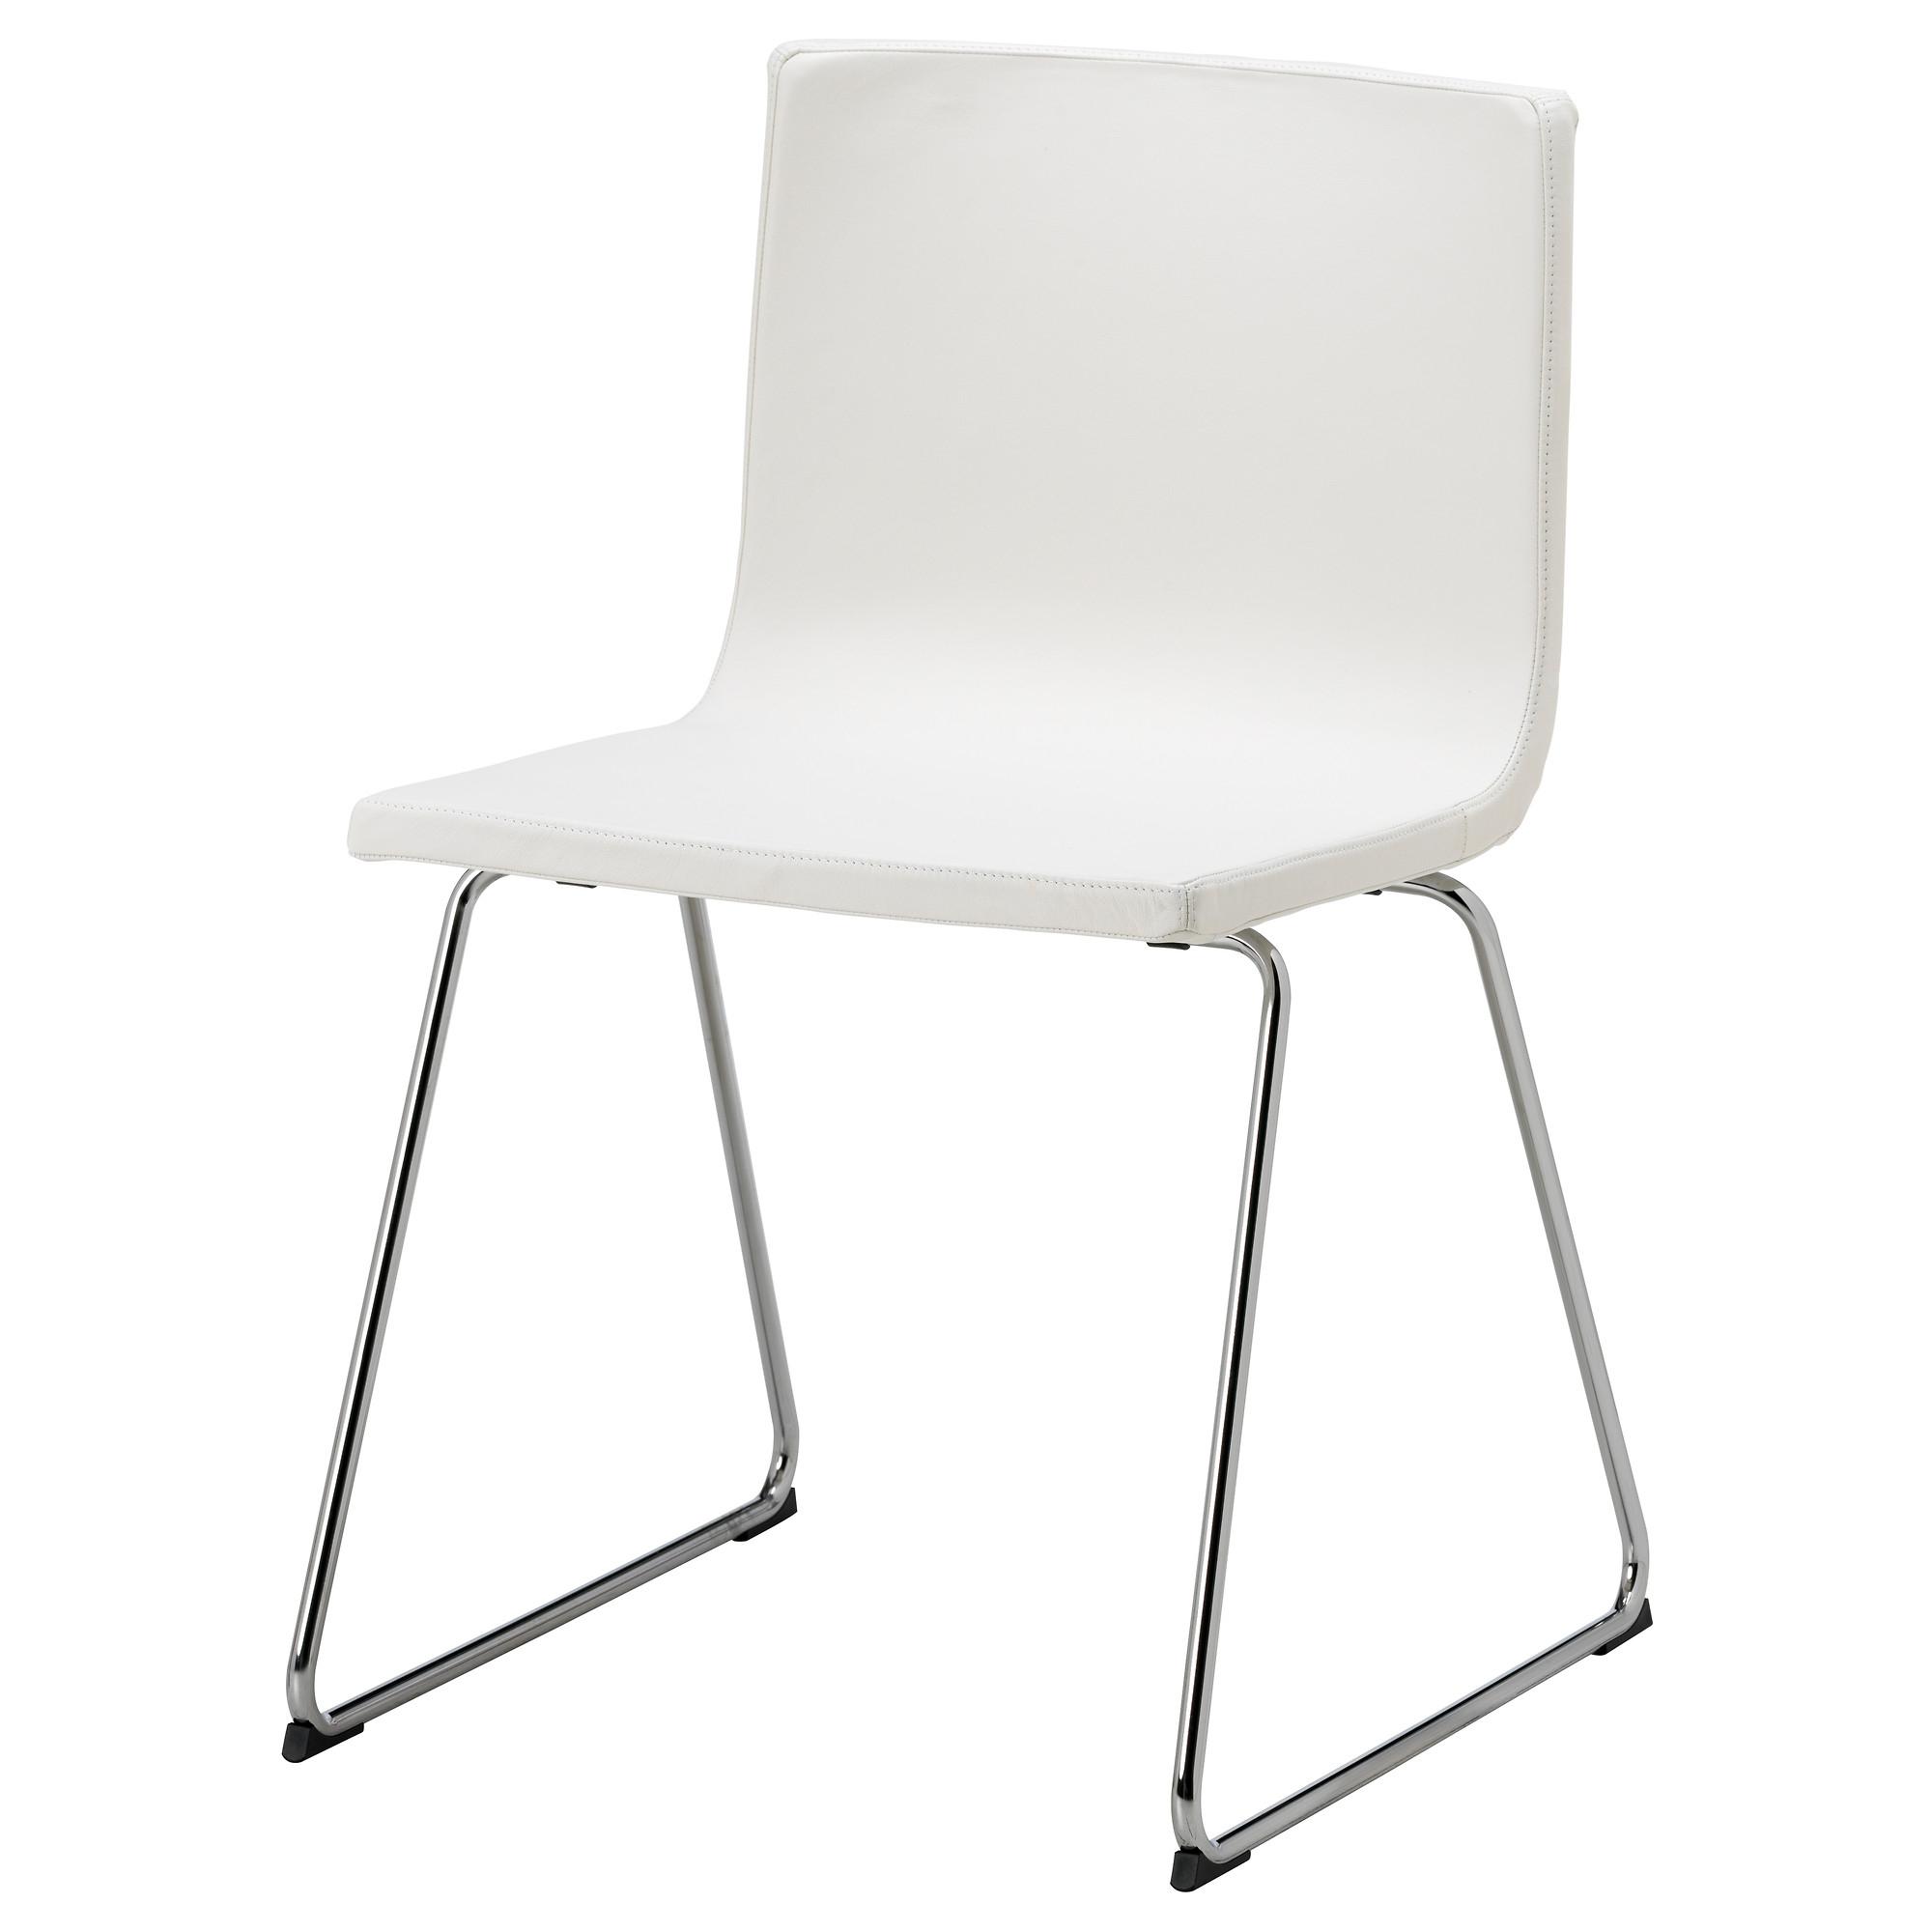 Bernhard silla piel cromado kavat blanco - Sillas de exterior ikea ...